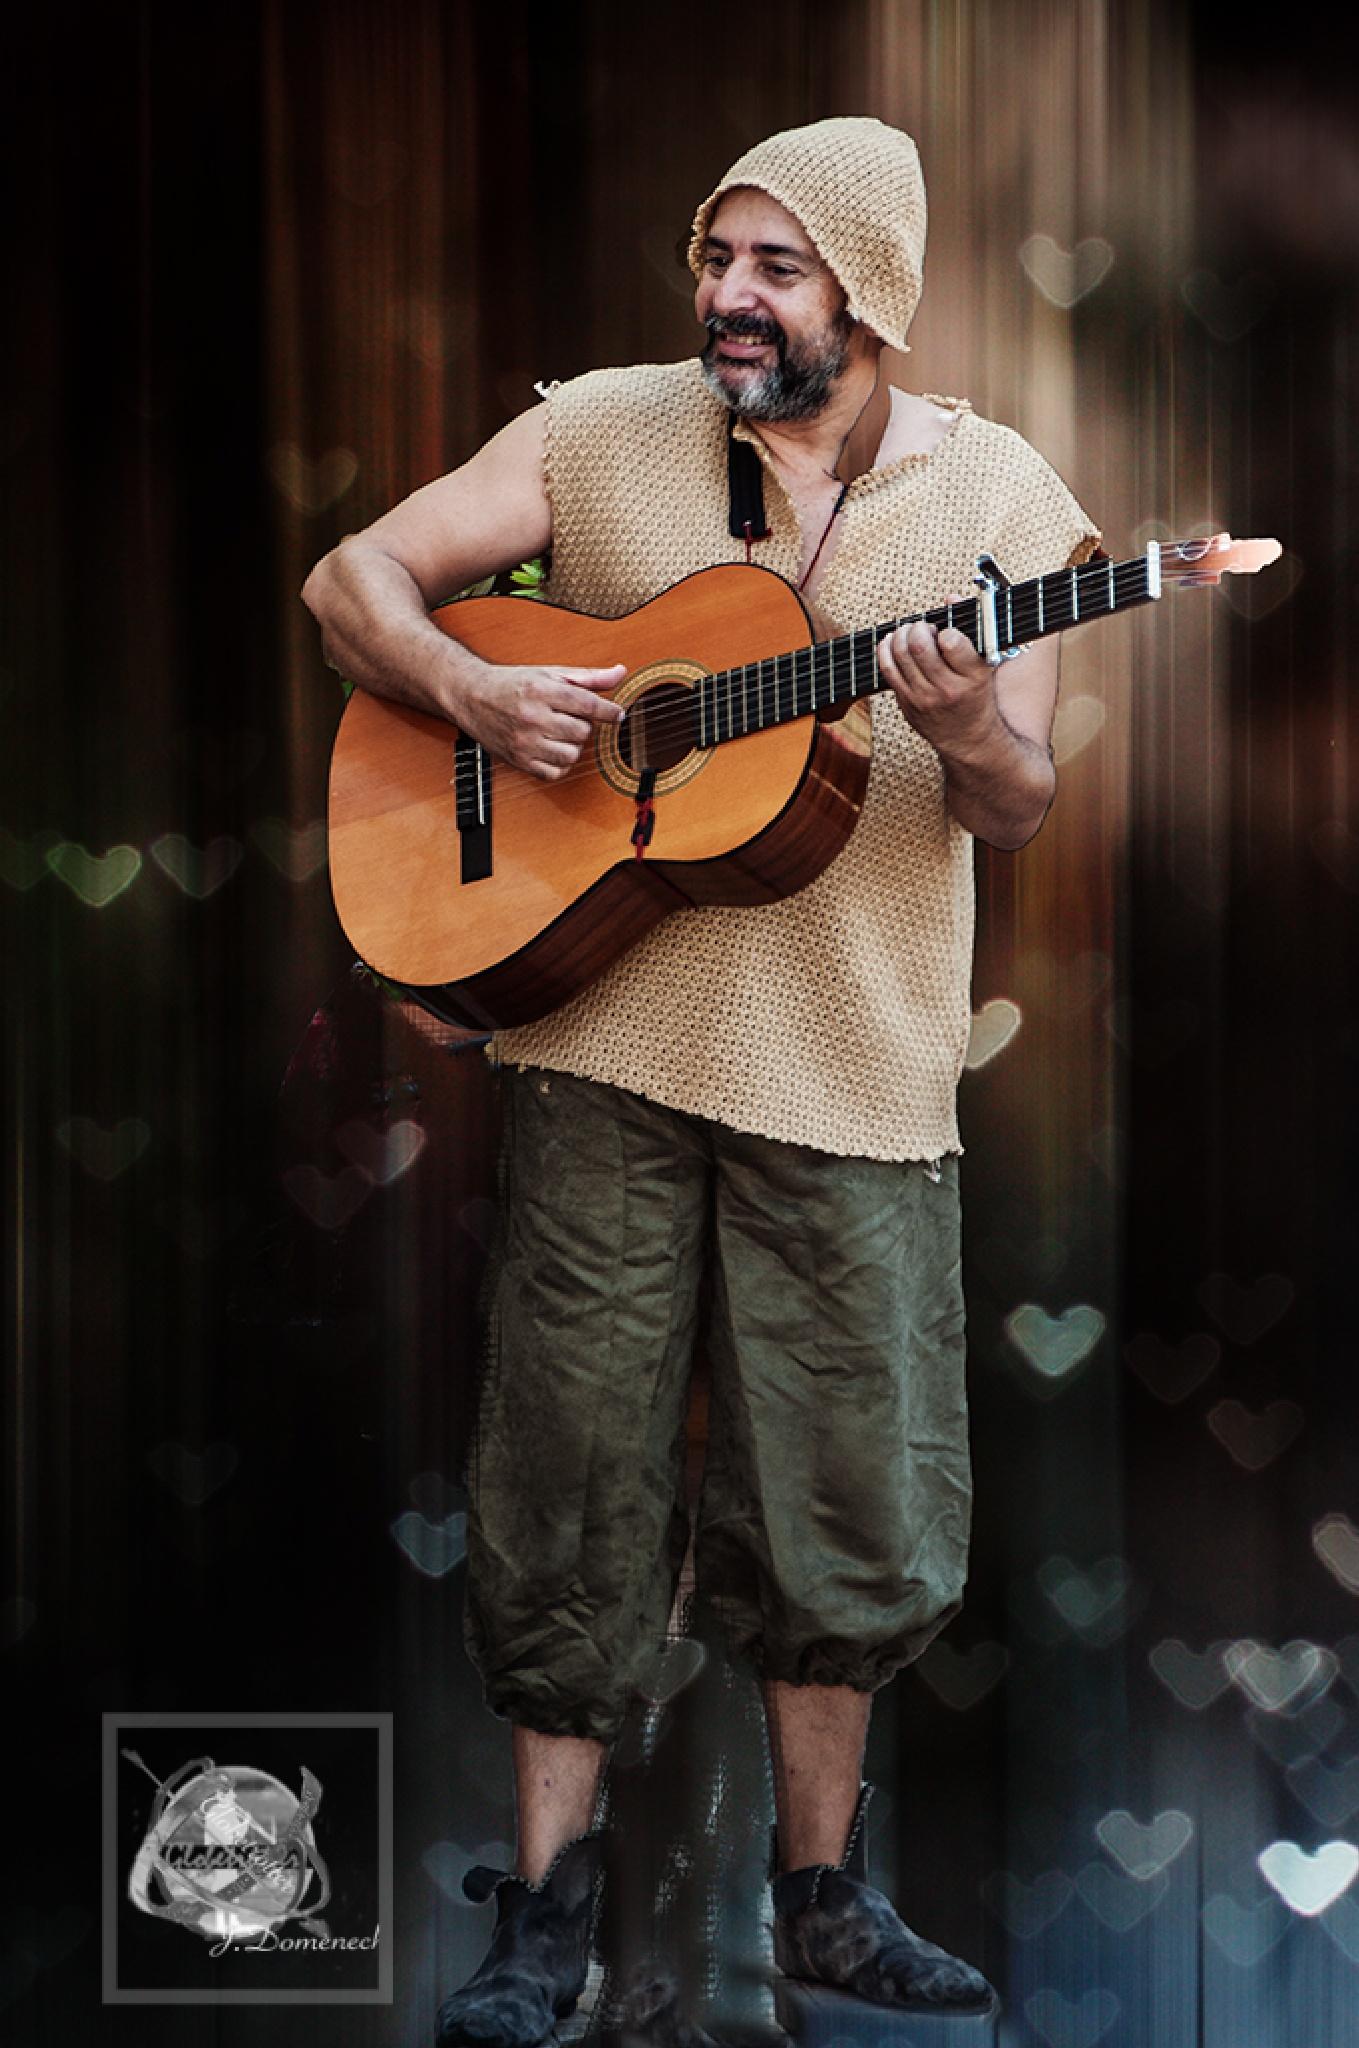 El trovador de cançons d'amor by jesusdomenechfont9